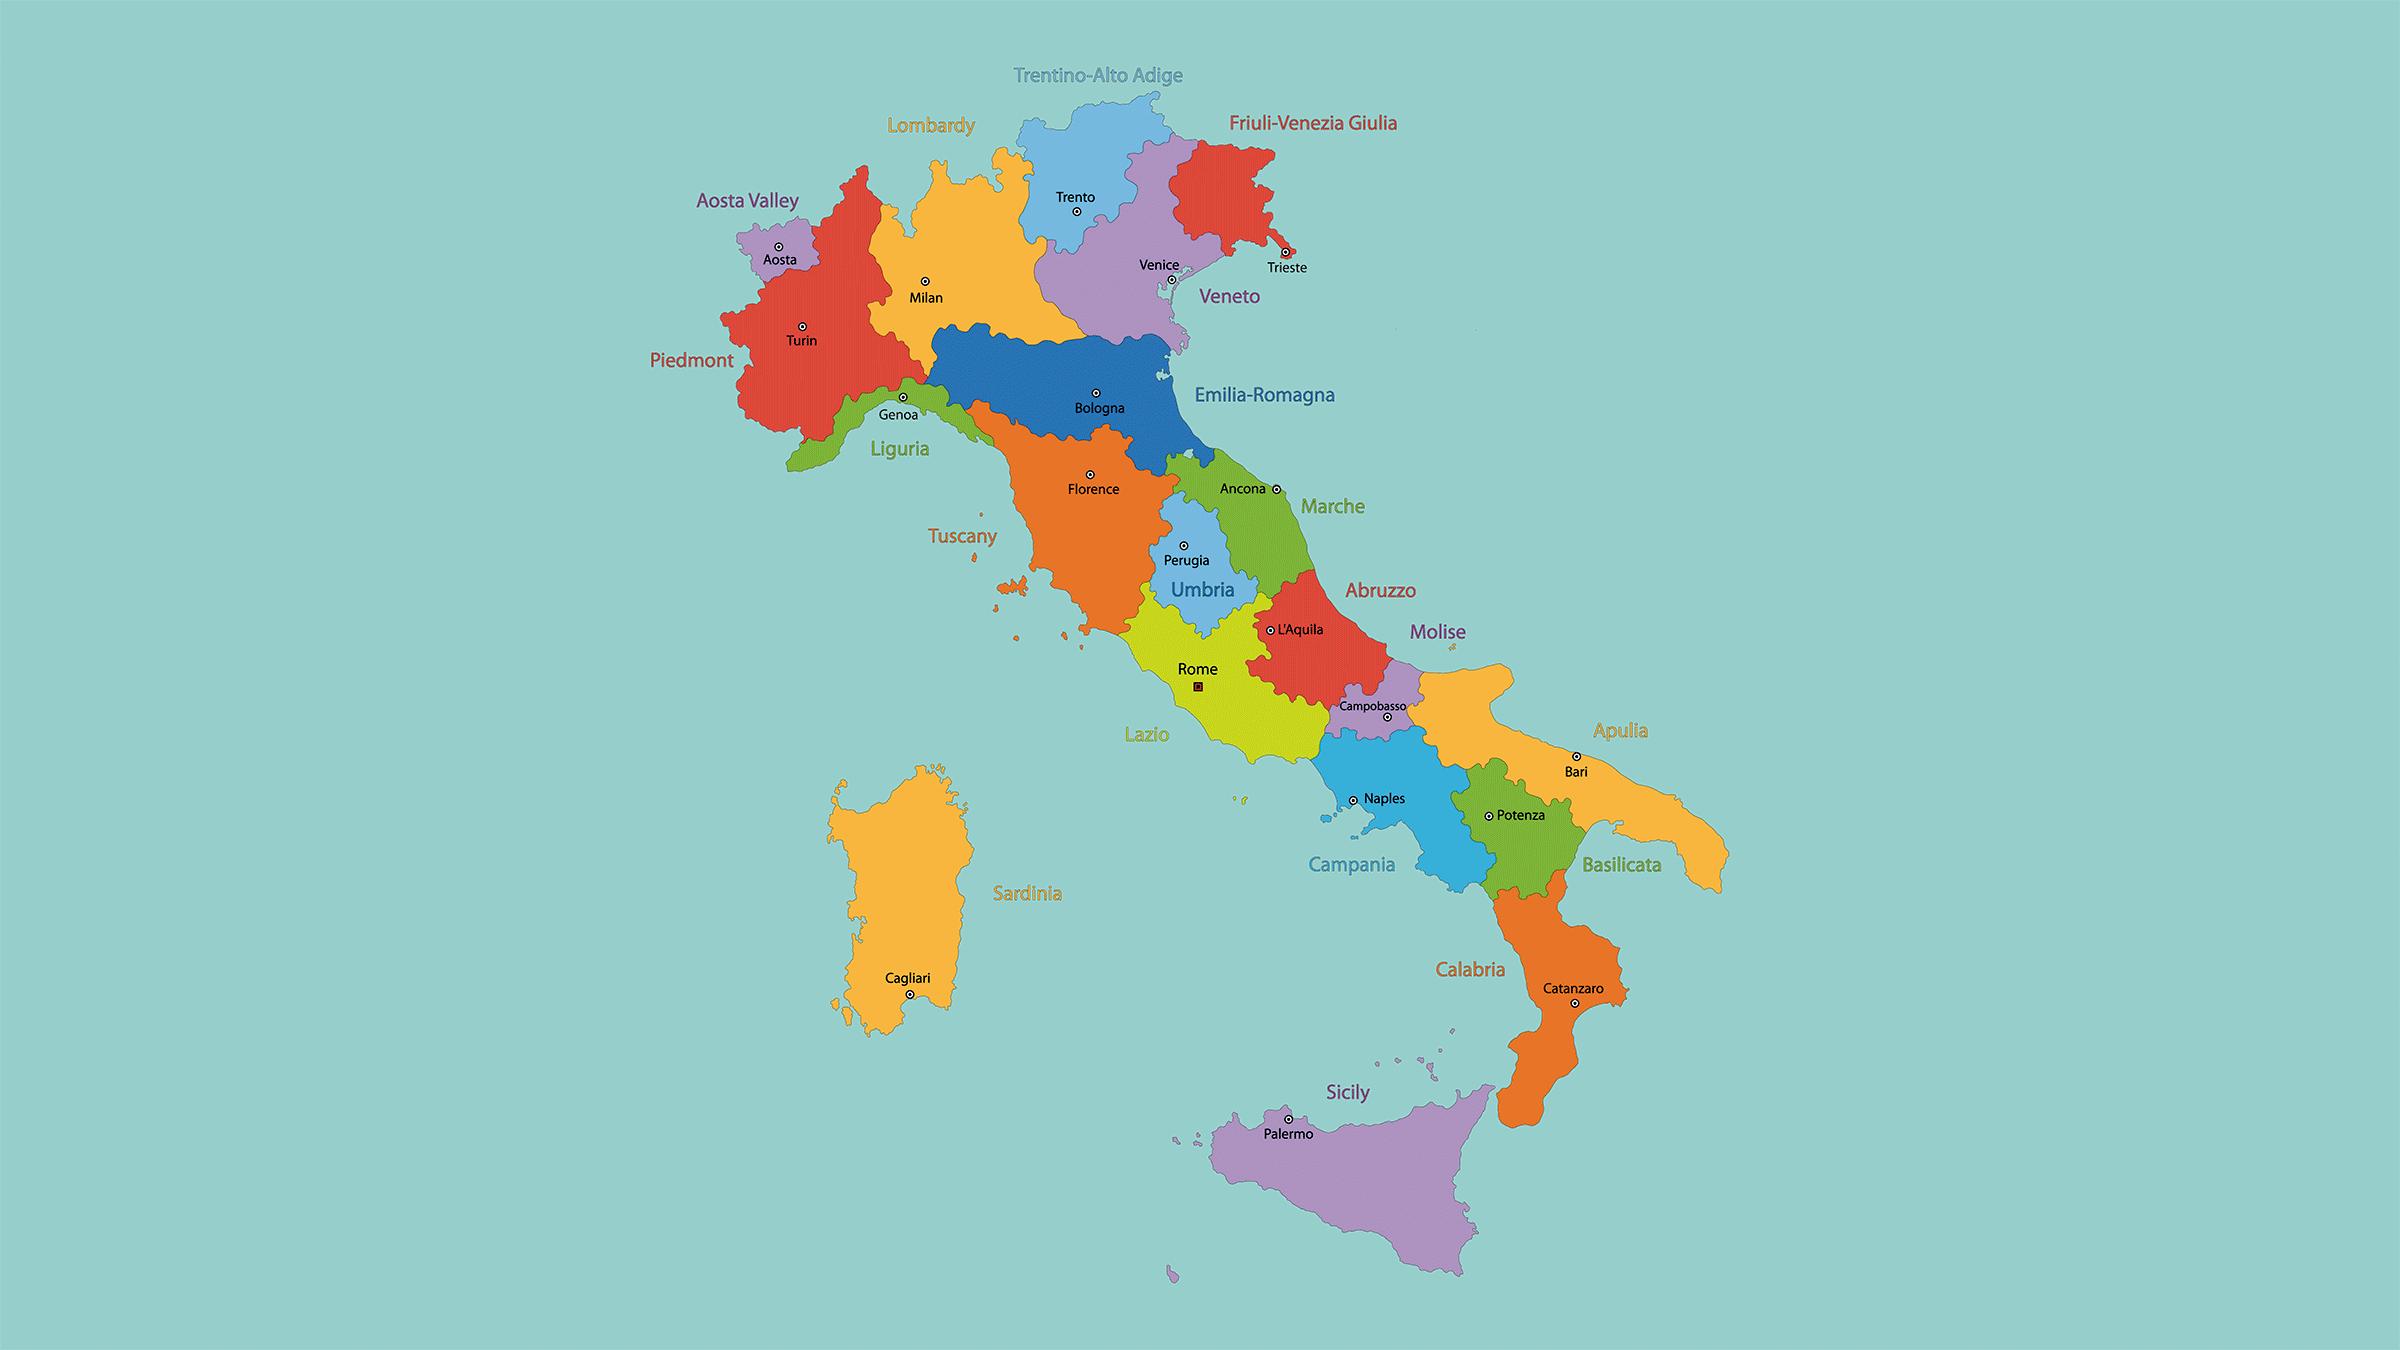 italia mapa politico Mapa político de Italia: regiones y capitales | MAPAS DE ITALIA  italia mapa politico